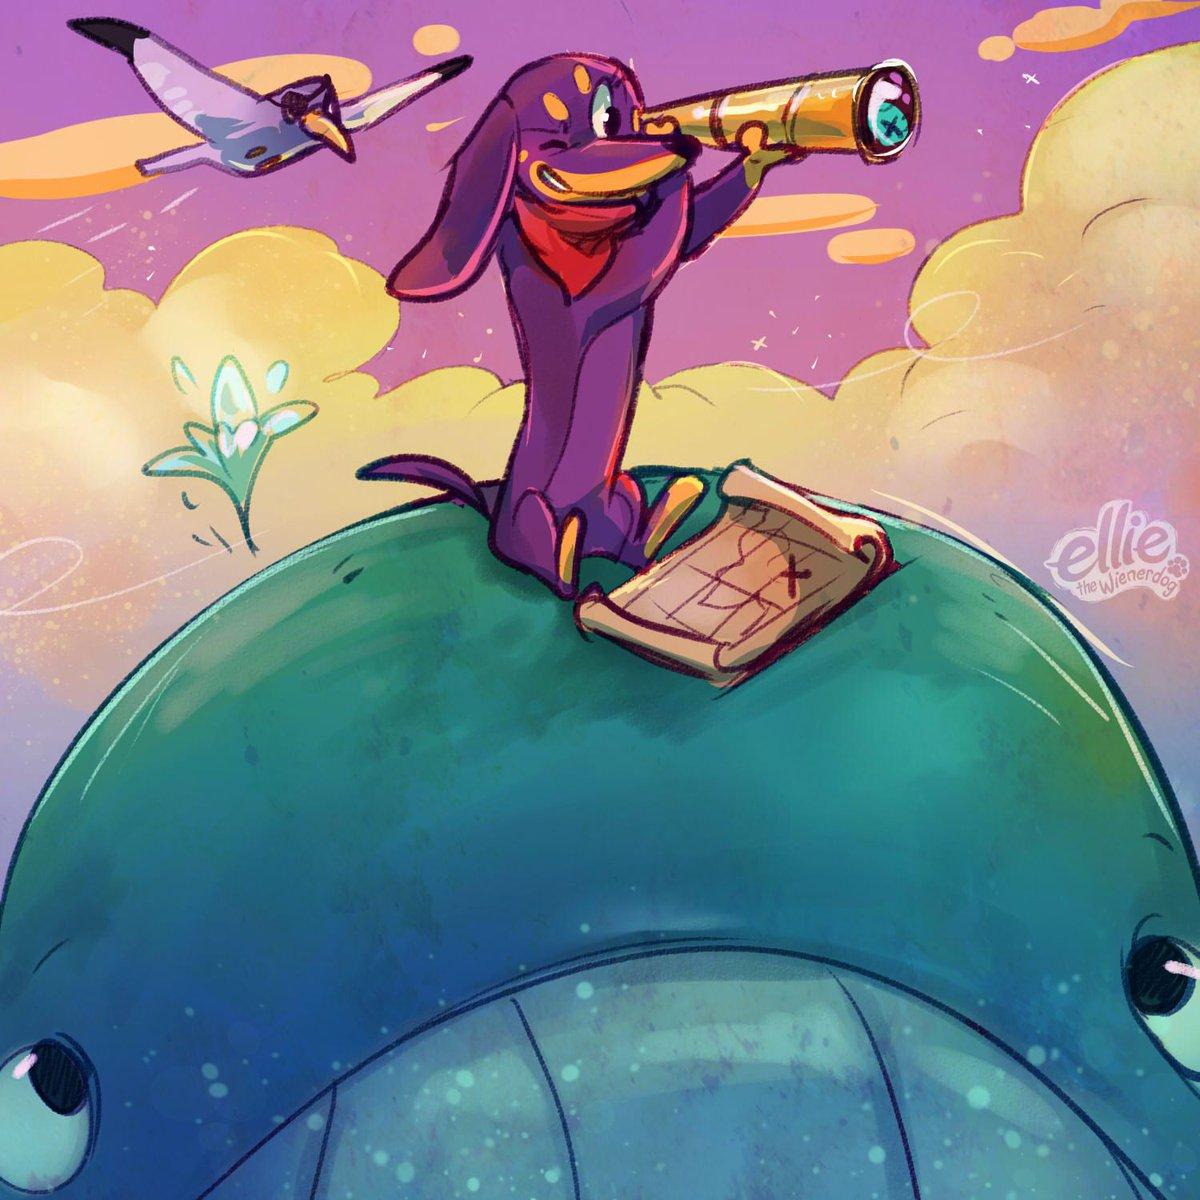 Ahhh, there it is!  The weekend is just over the horizon ... just keep swimming! 🐾💜🐾 #thursdaymood #elliethewienerdog #purplewienerdog